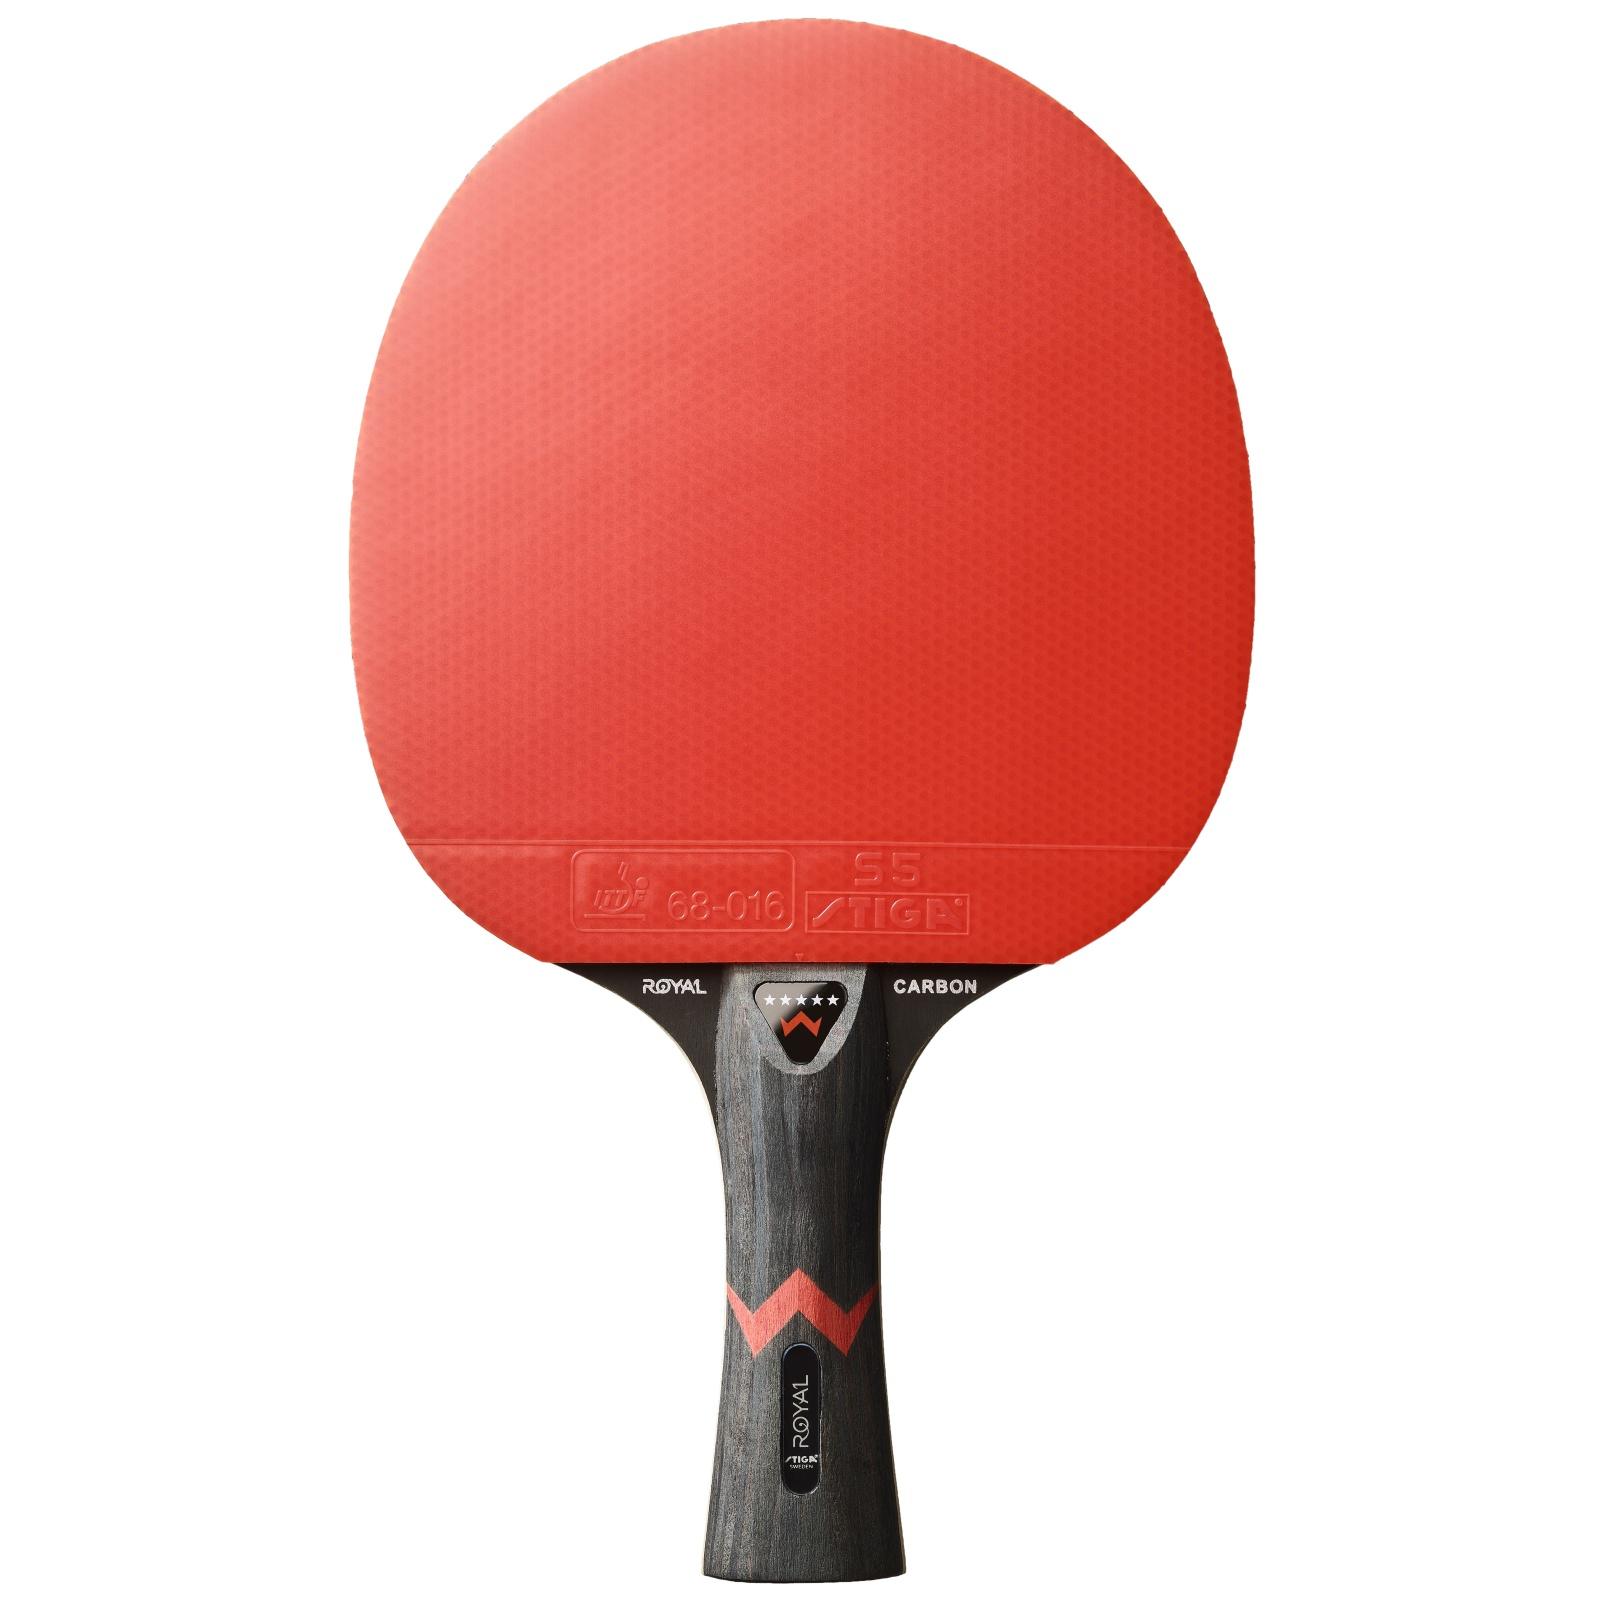 Raketa na stolný tenis STIGA Royal Carbon*****